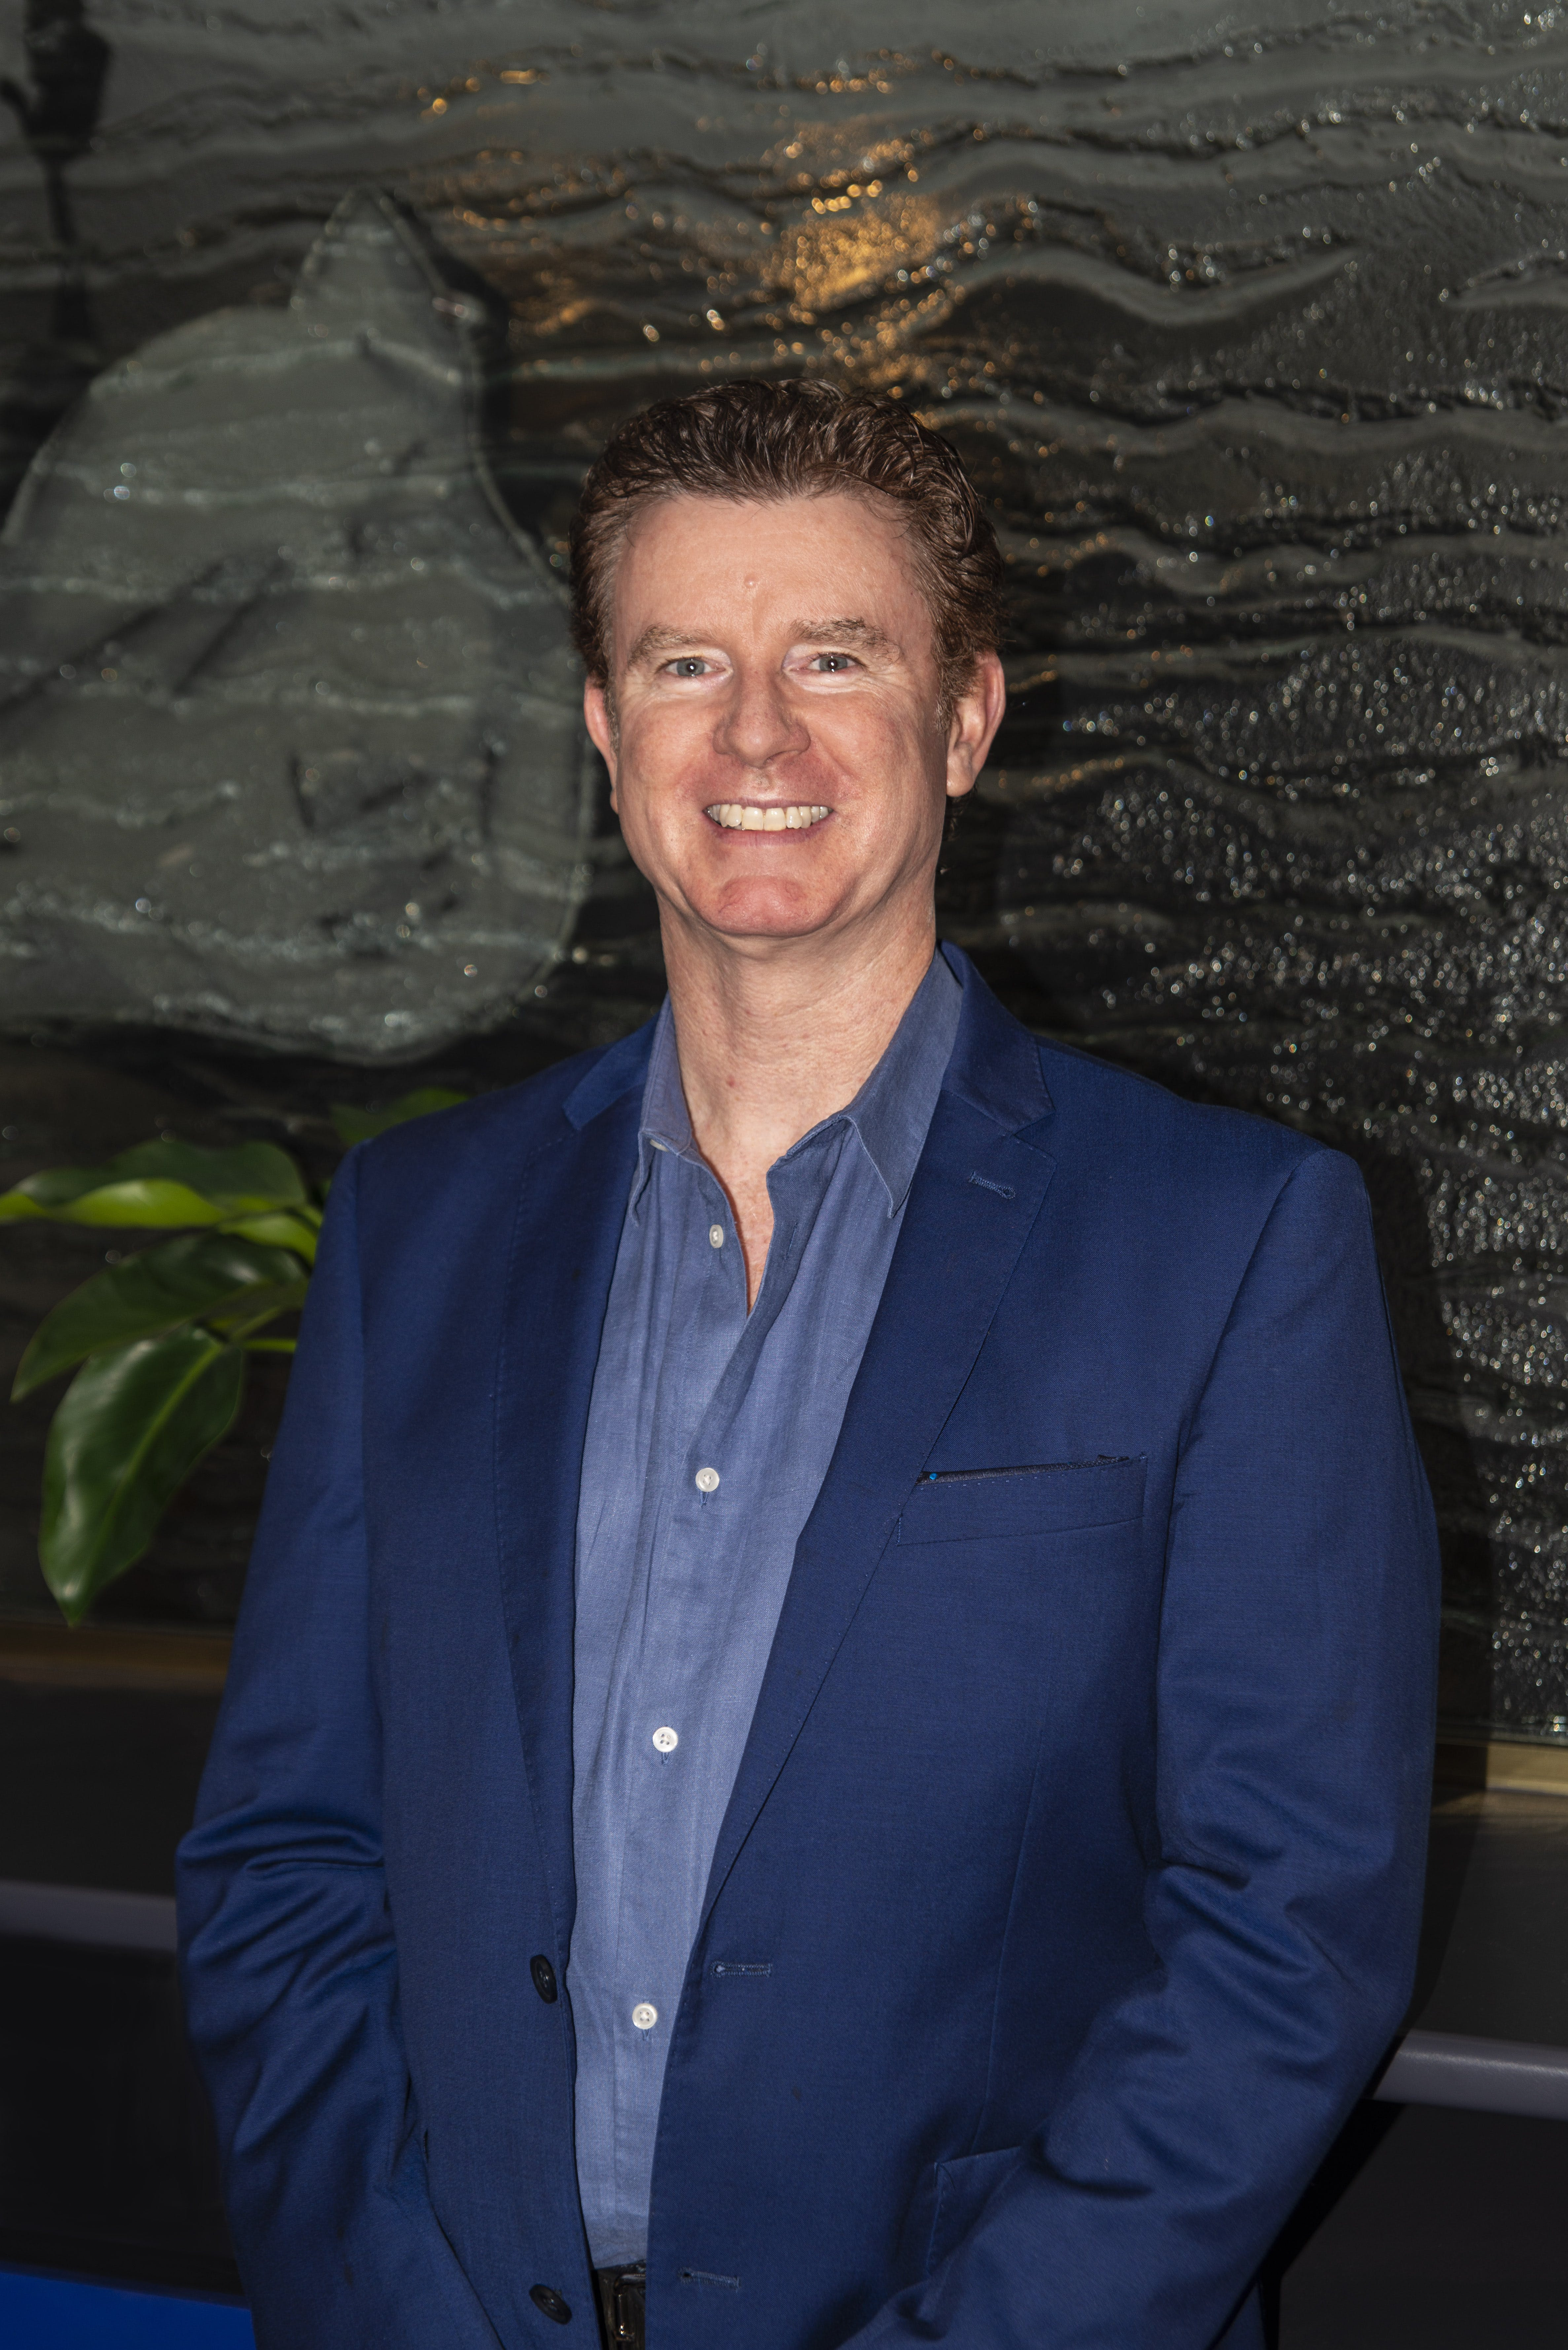 Photo of Dr John de Voy